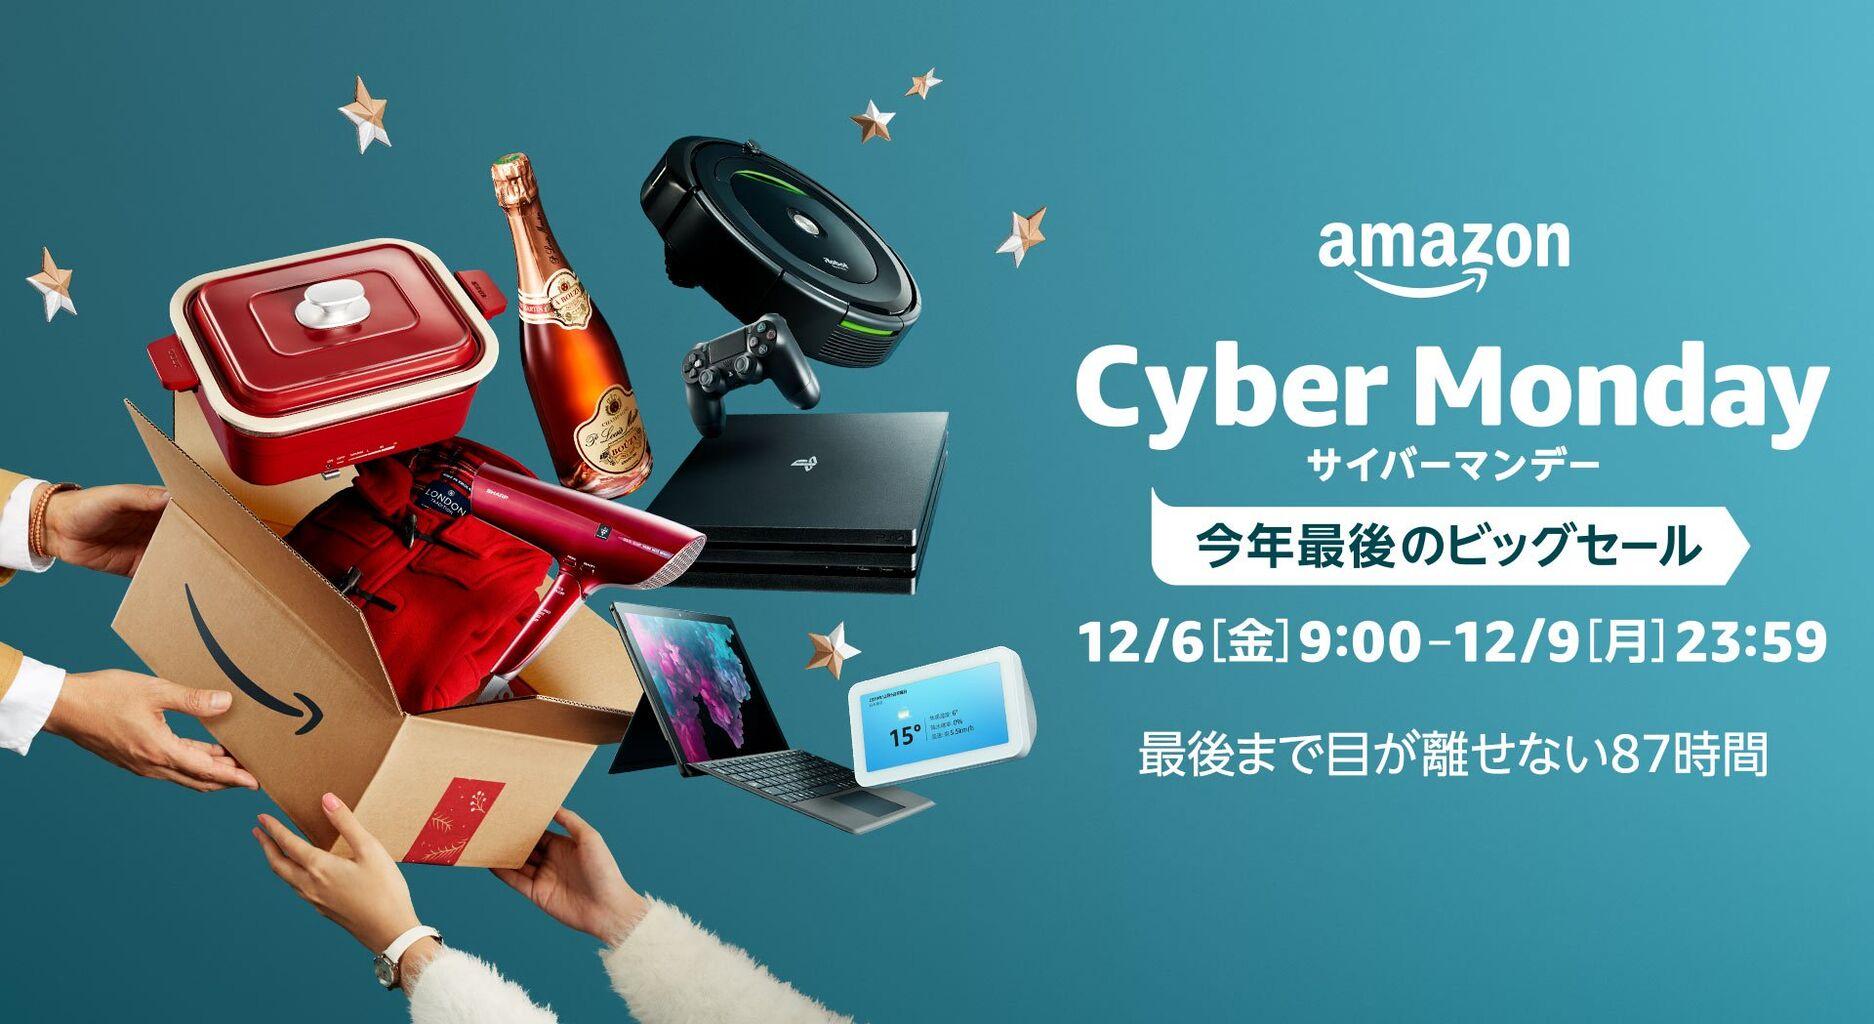 【Amazon CyberMonday】そろそろ開始!12/6(金)9時スタート!「PS4+ソフト2本セット」など目玉商品ズラリ!最大8.5%還元ポイントアップキャンペーンに参加しておこう!